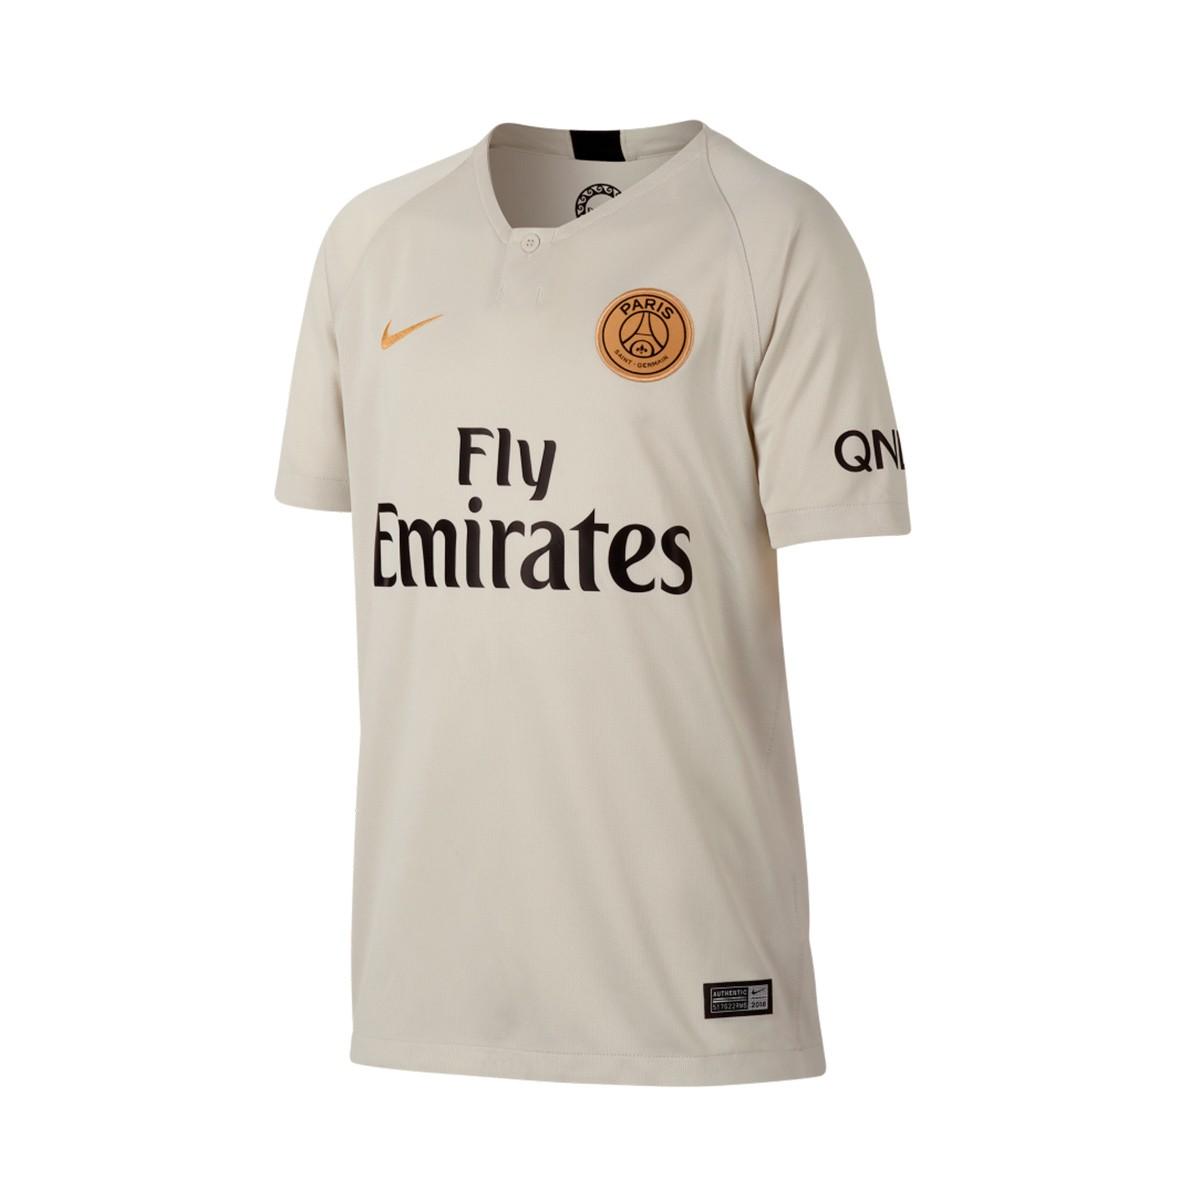 Camiseta Nike Paris Saint-Germain Stadium Segunda Equipación 2018-2019 Niño  Light bone-Truly gold - Soloporteros es ahora Fútbol Emotion d2db6bc89a567